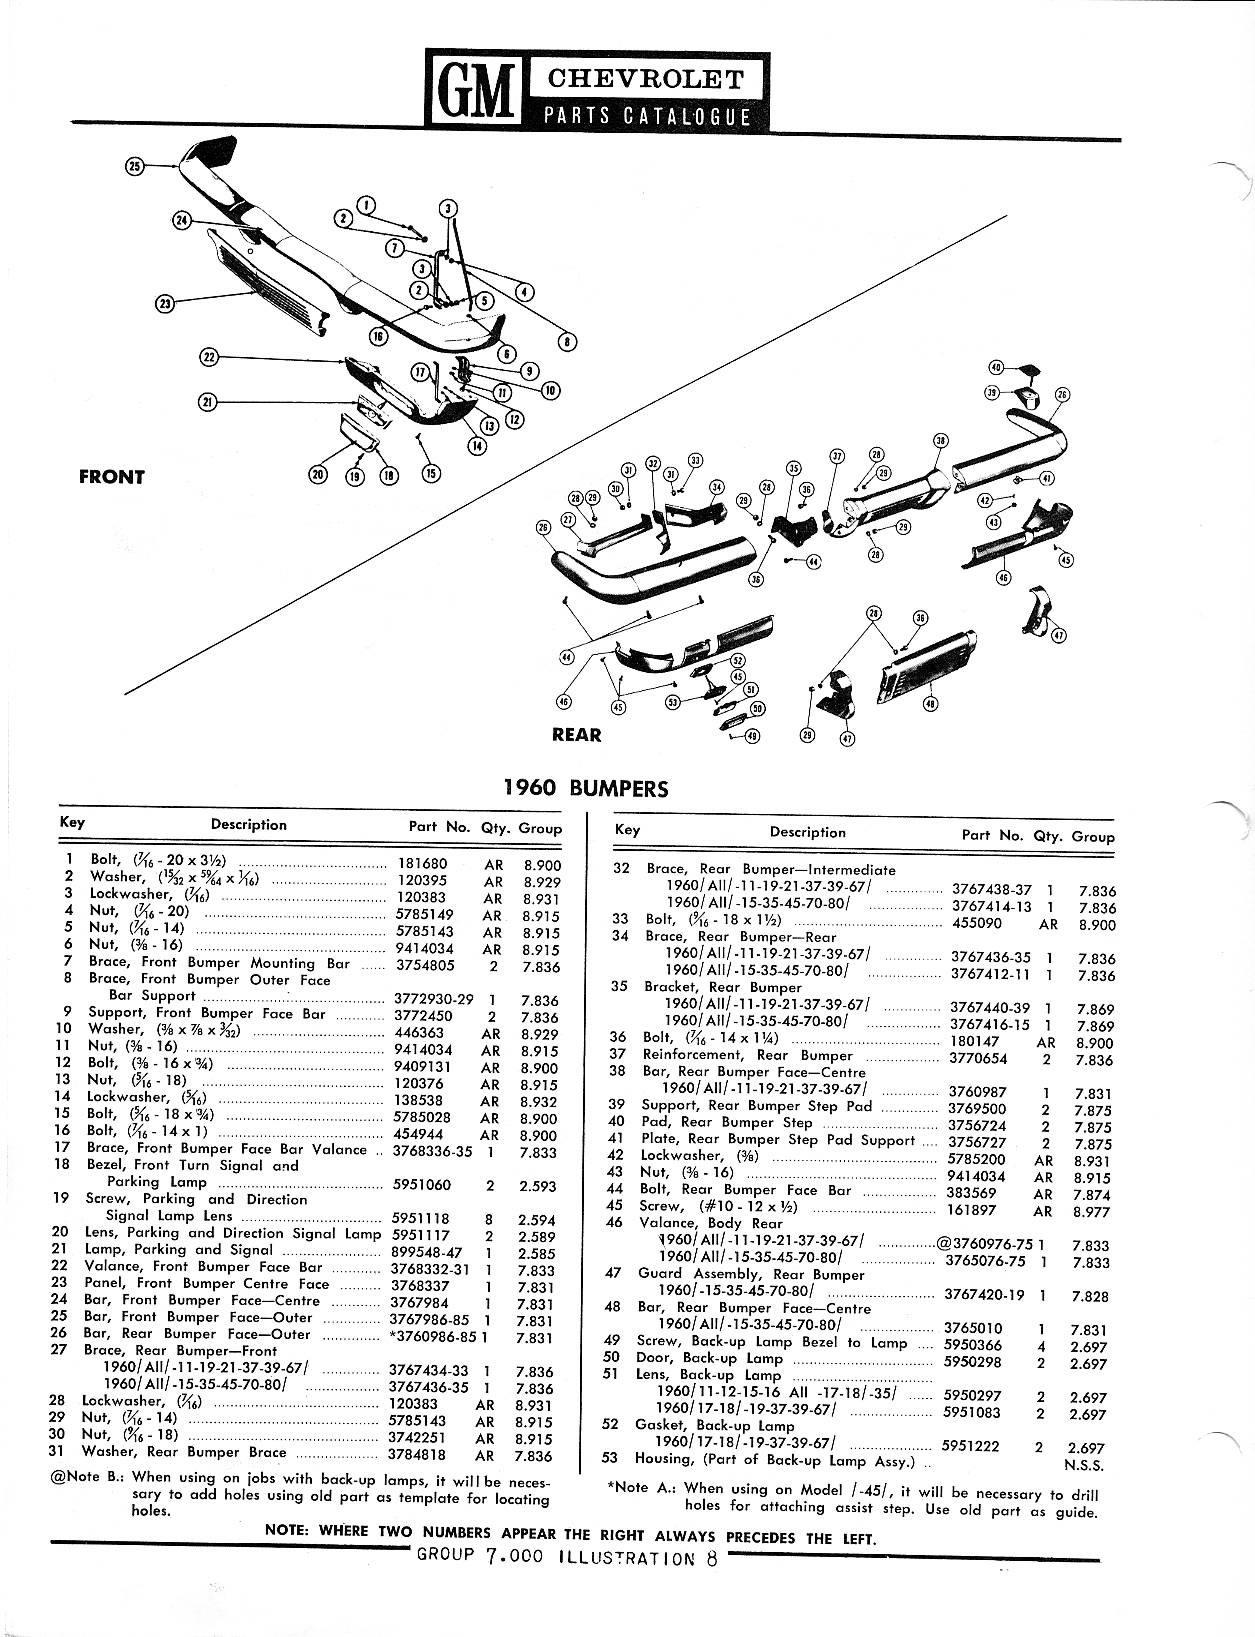 1958-1968 Chevrolet Parts Catalog / Image56.jpg